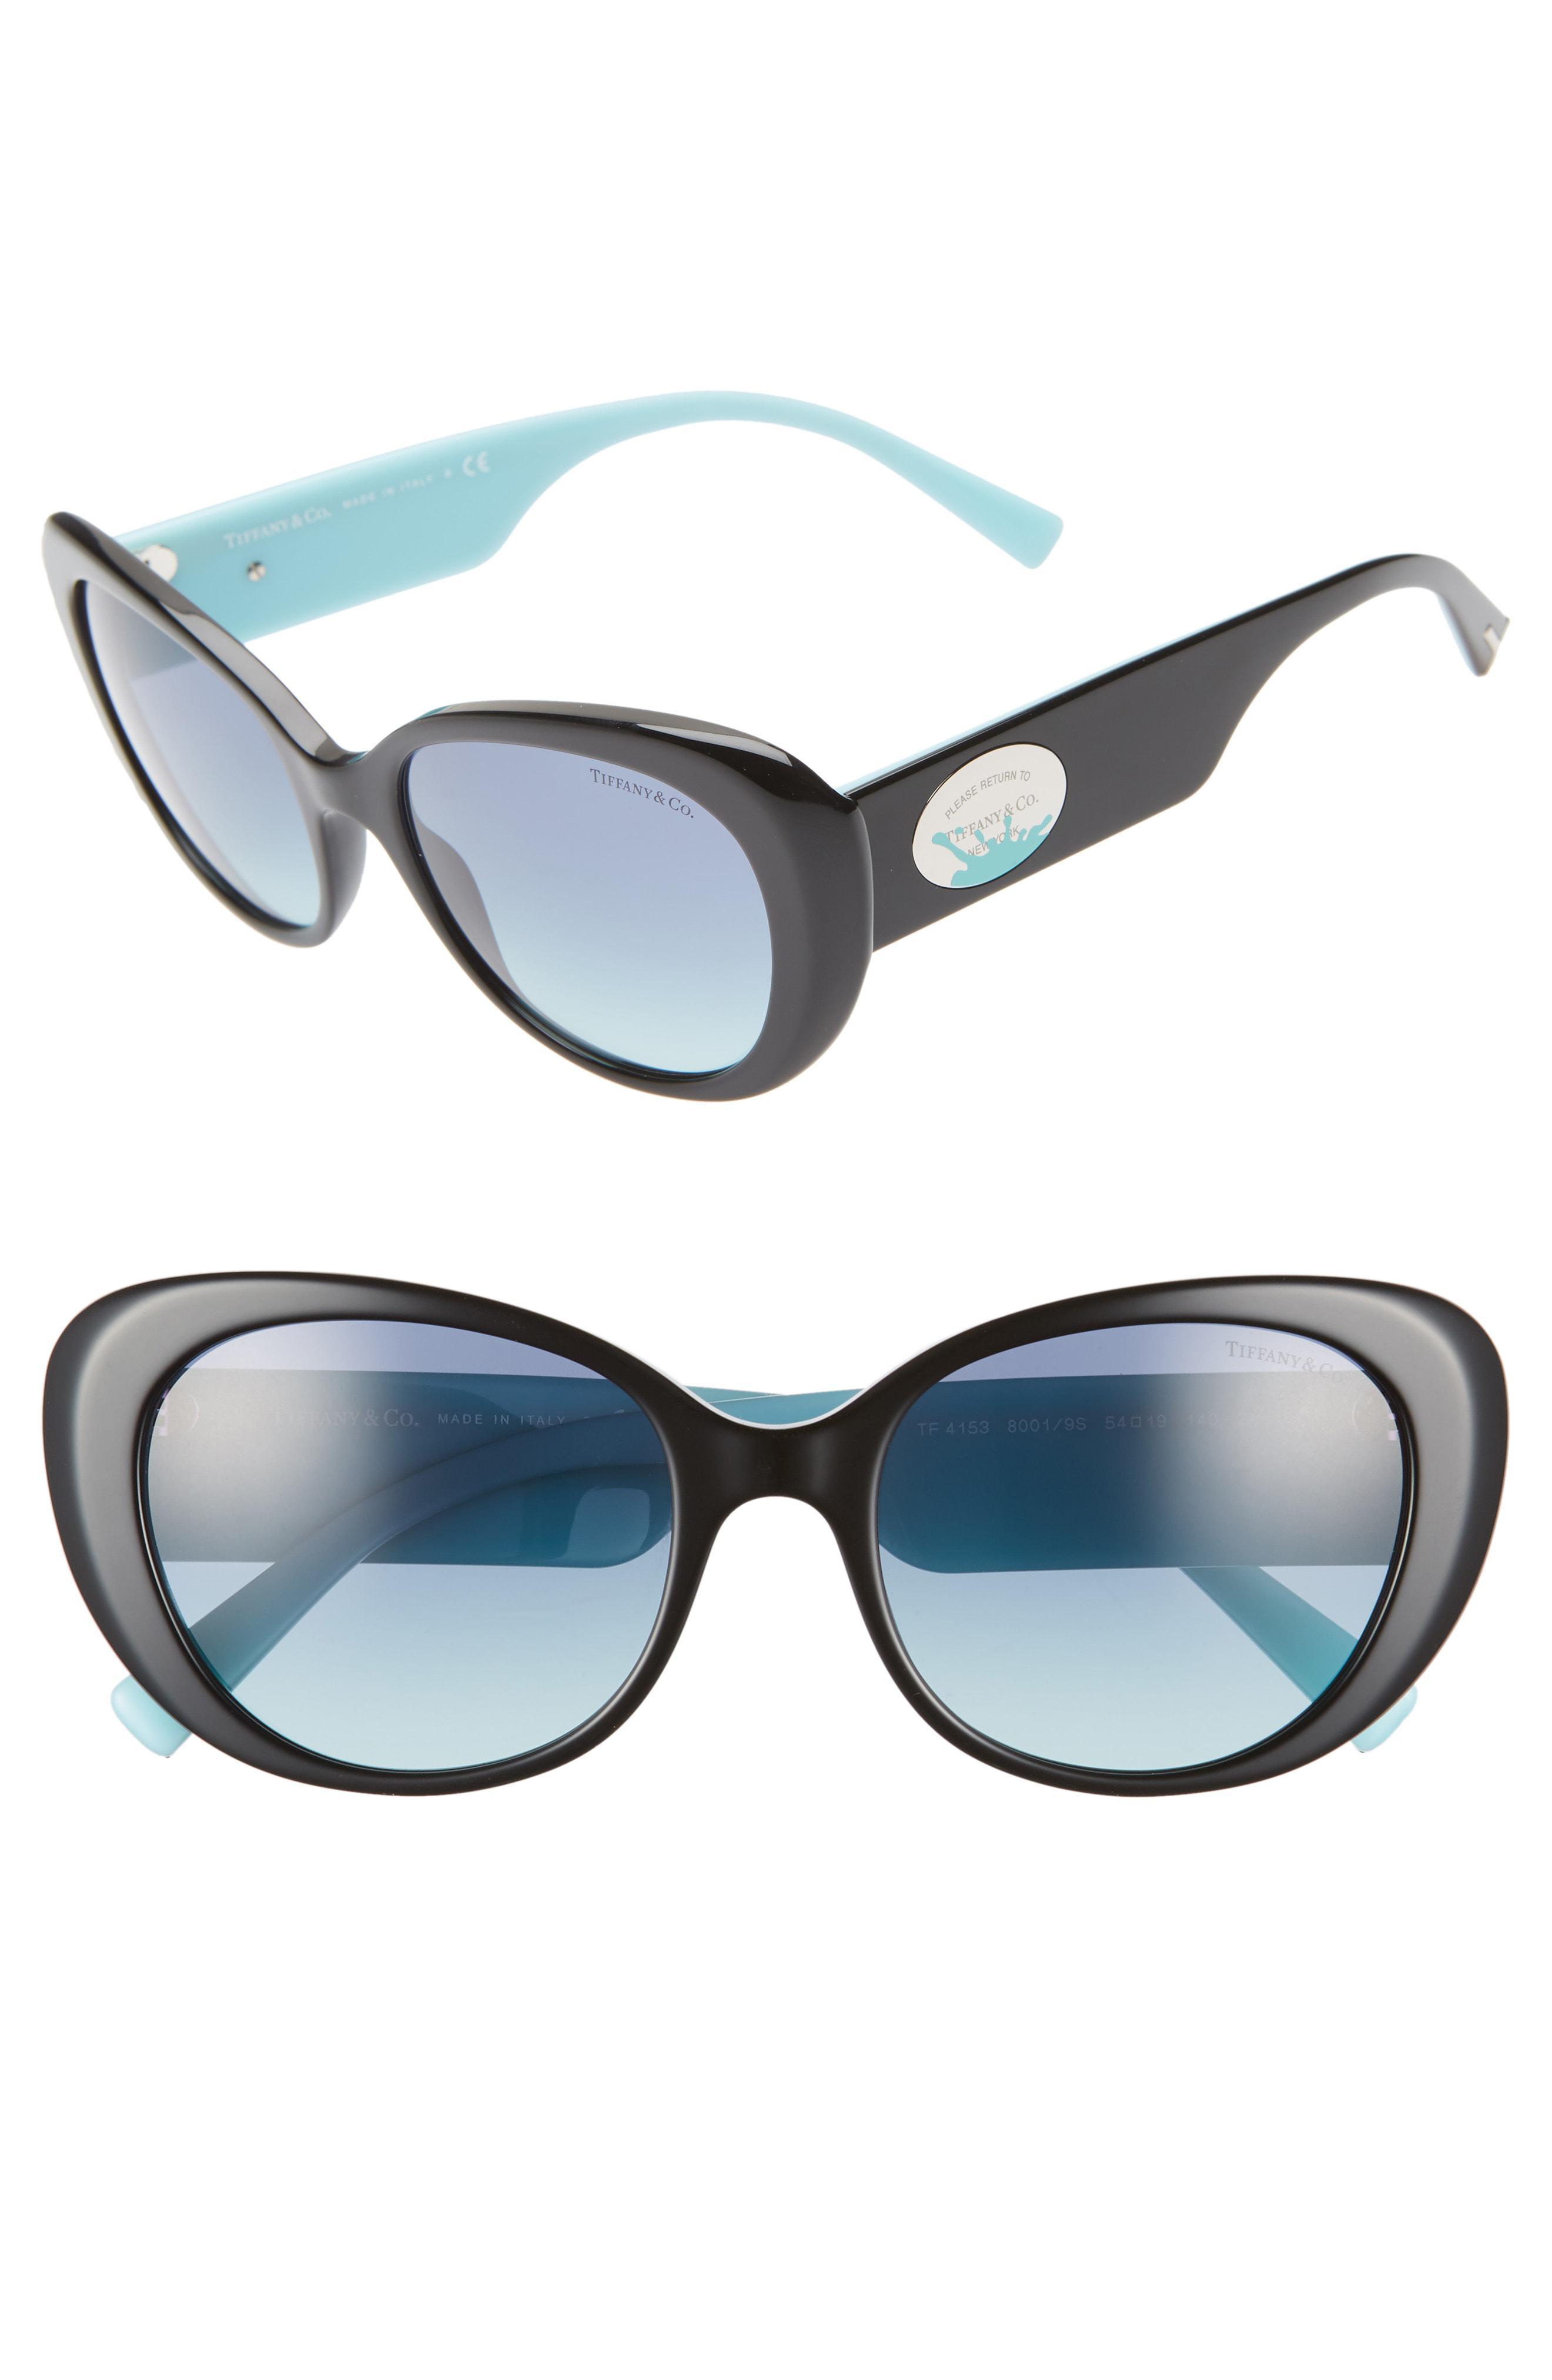 498e7bdbe69 Lyst - Tiffany   Co Return To Tiffany 54mm Oval Sunglasses in Blue